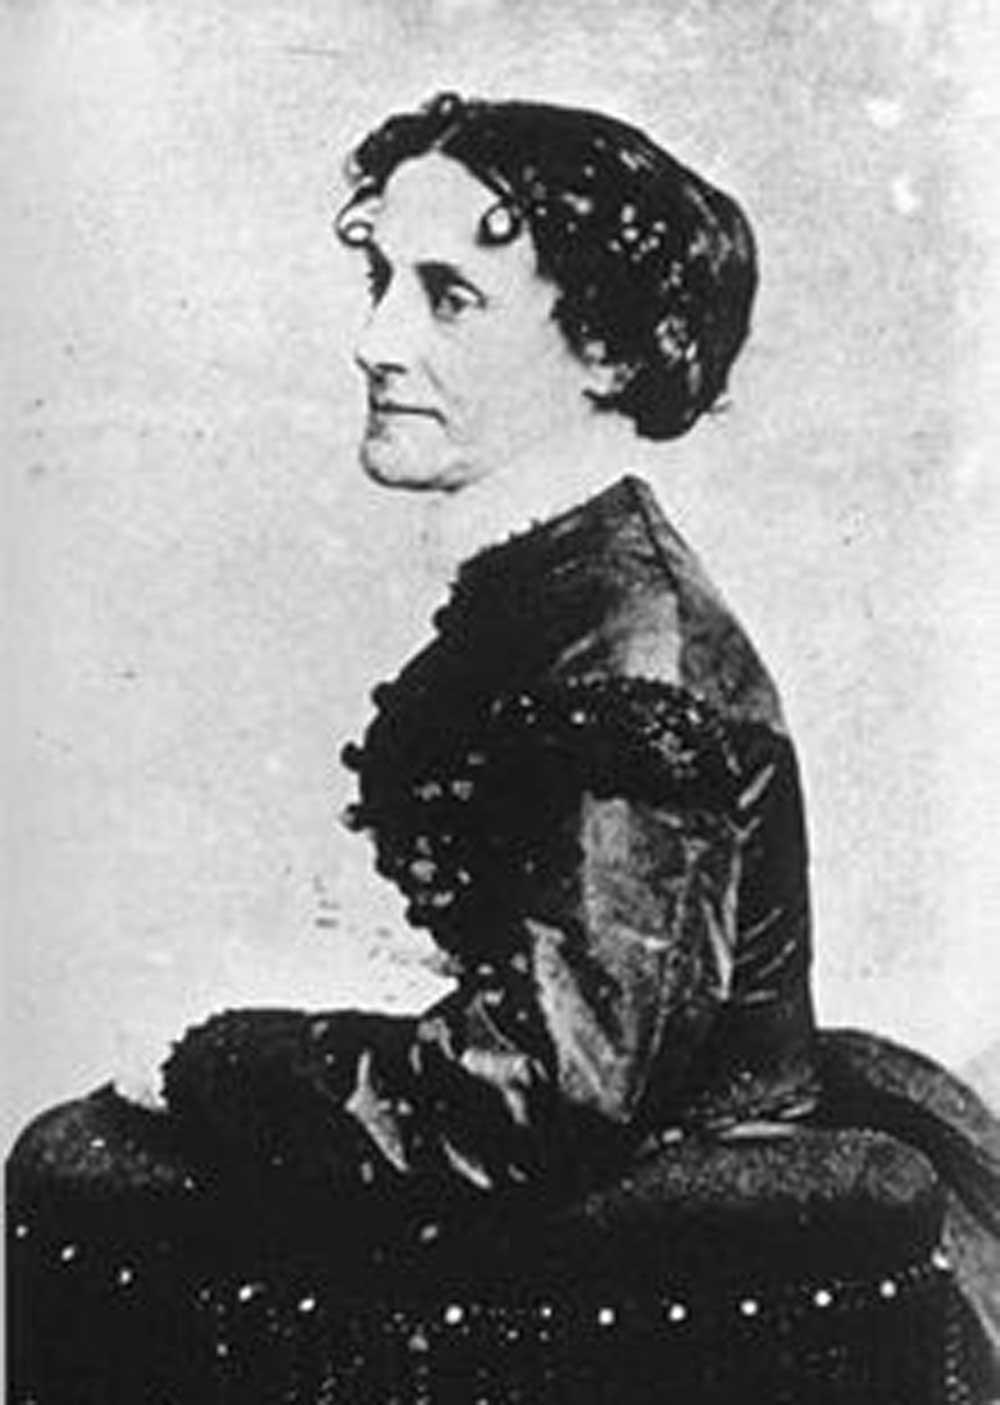 Nữ điệp viên, elizabeth van lew ,nội chiến mỹ